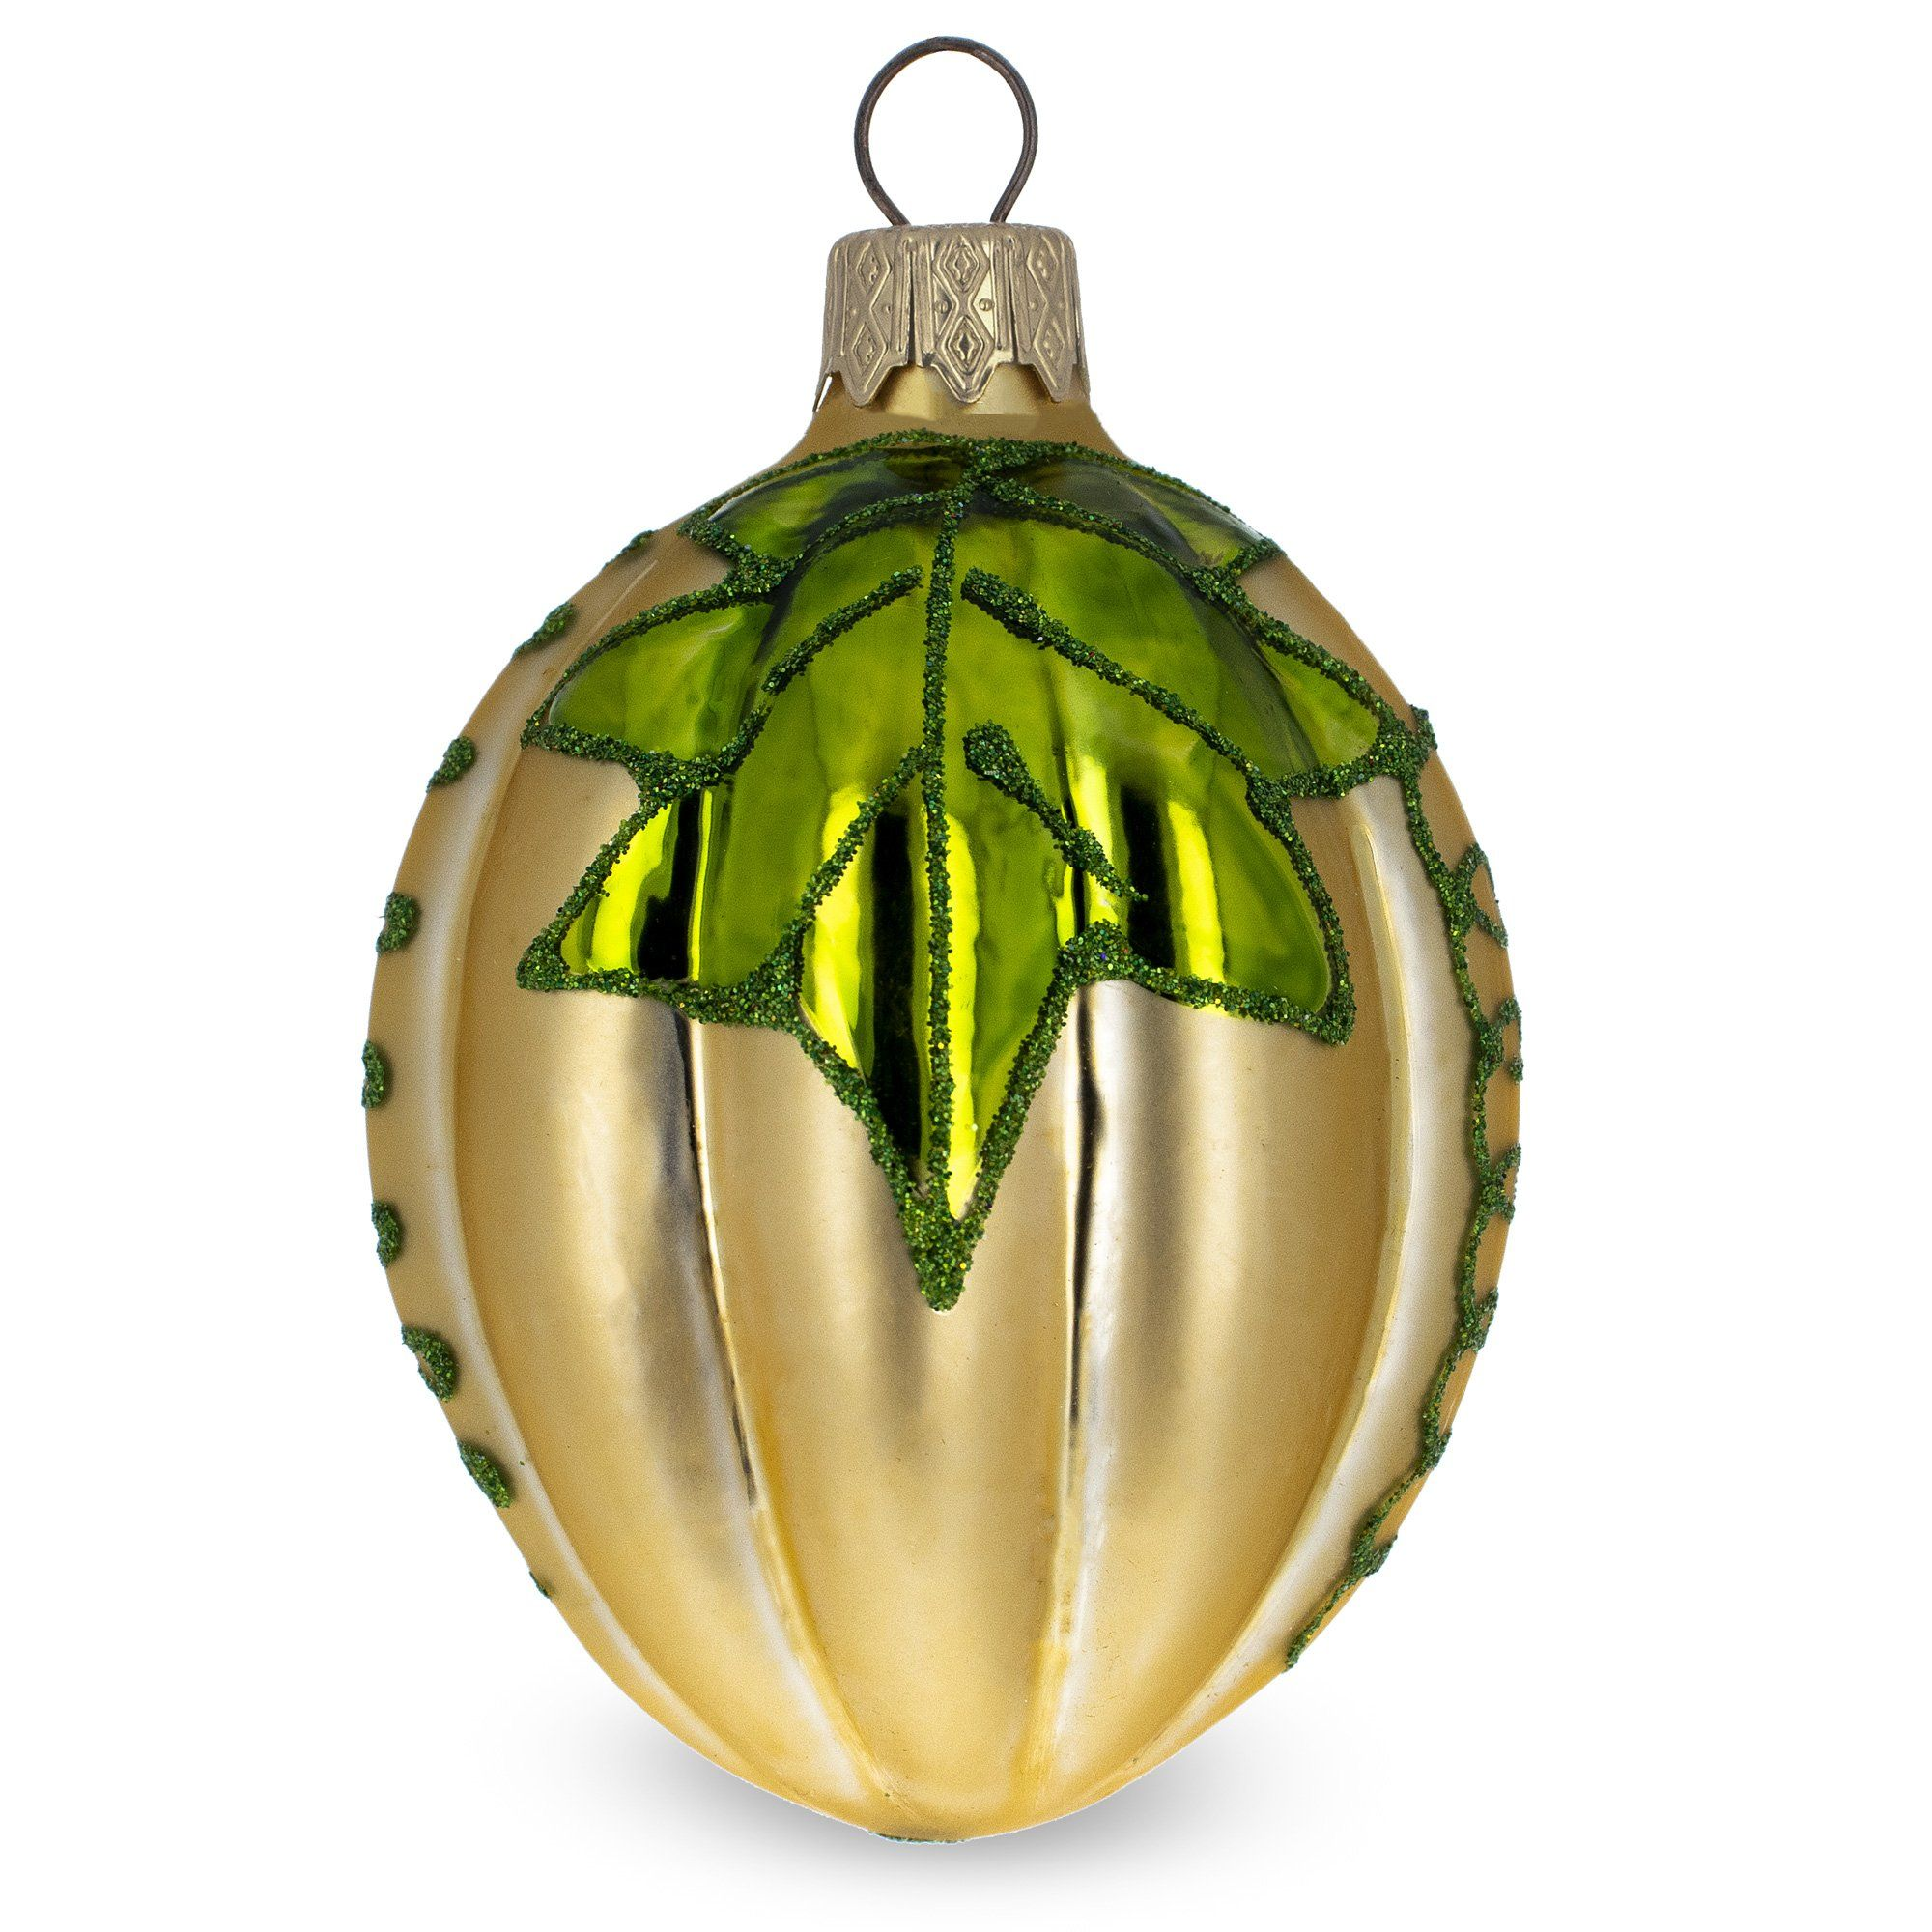 Pumpkin Mouth Blown Glass Christmas Ornament Figurine ...